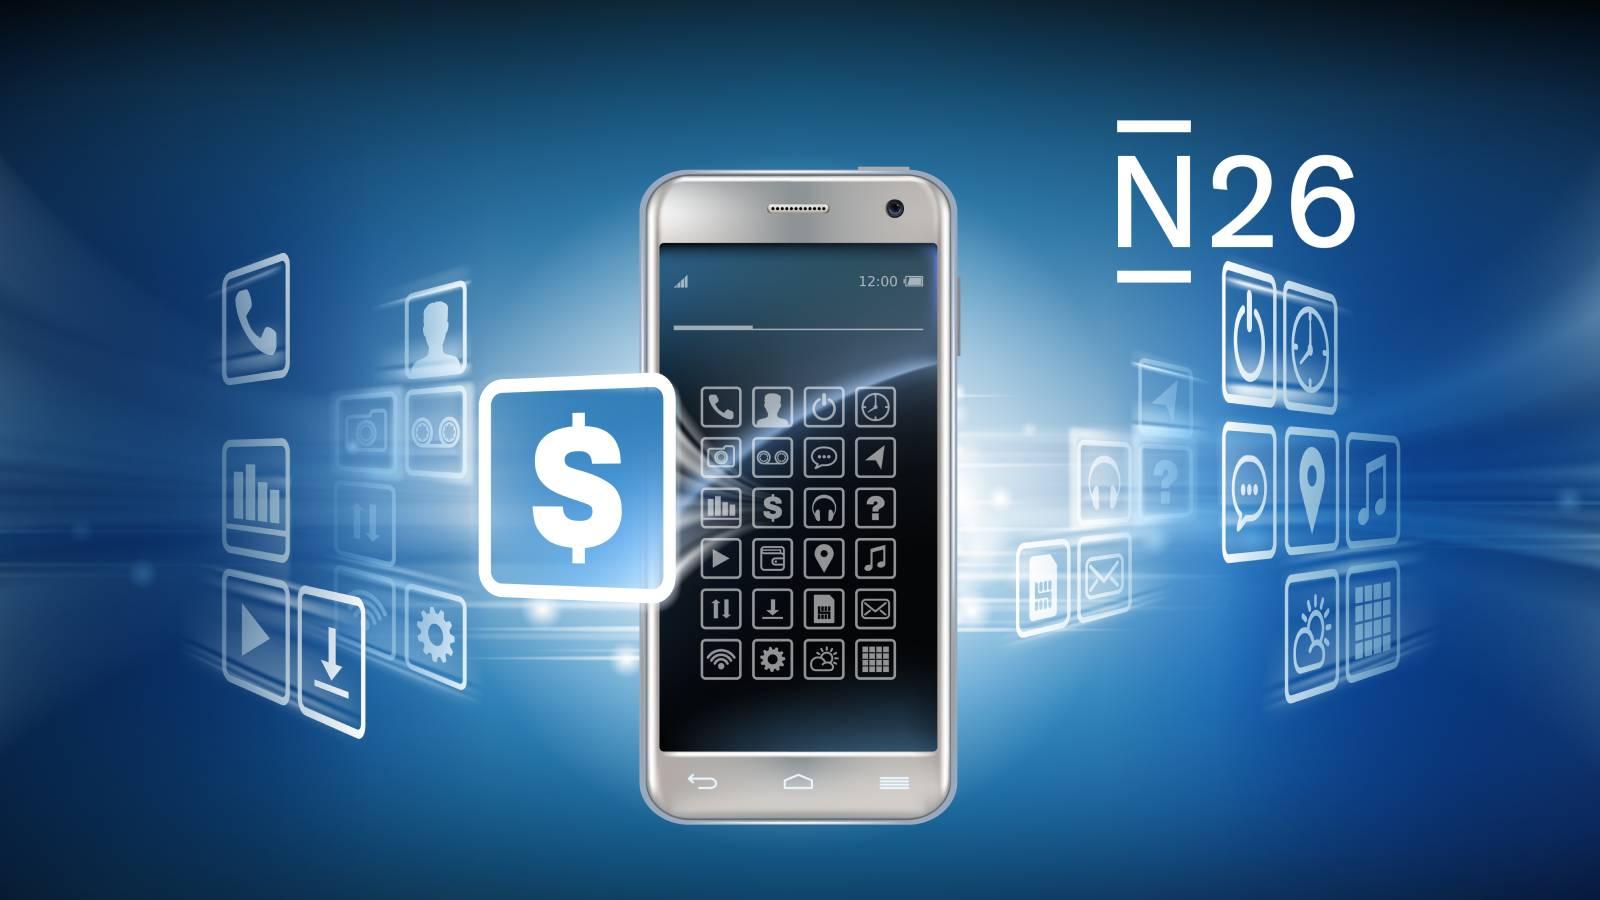 Fintech Investors Pump $100 Million into N26 to take Total Evaluation Past $3.5 Billion